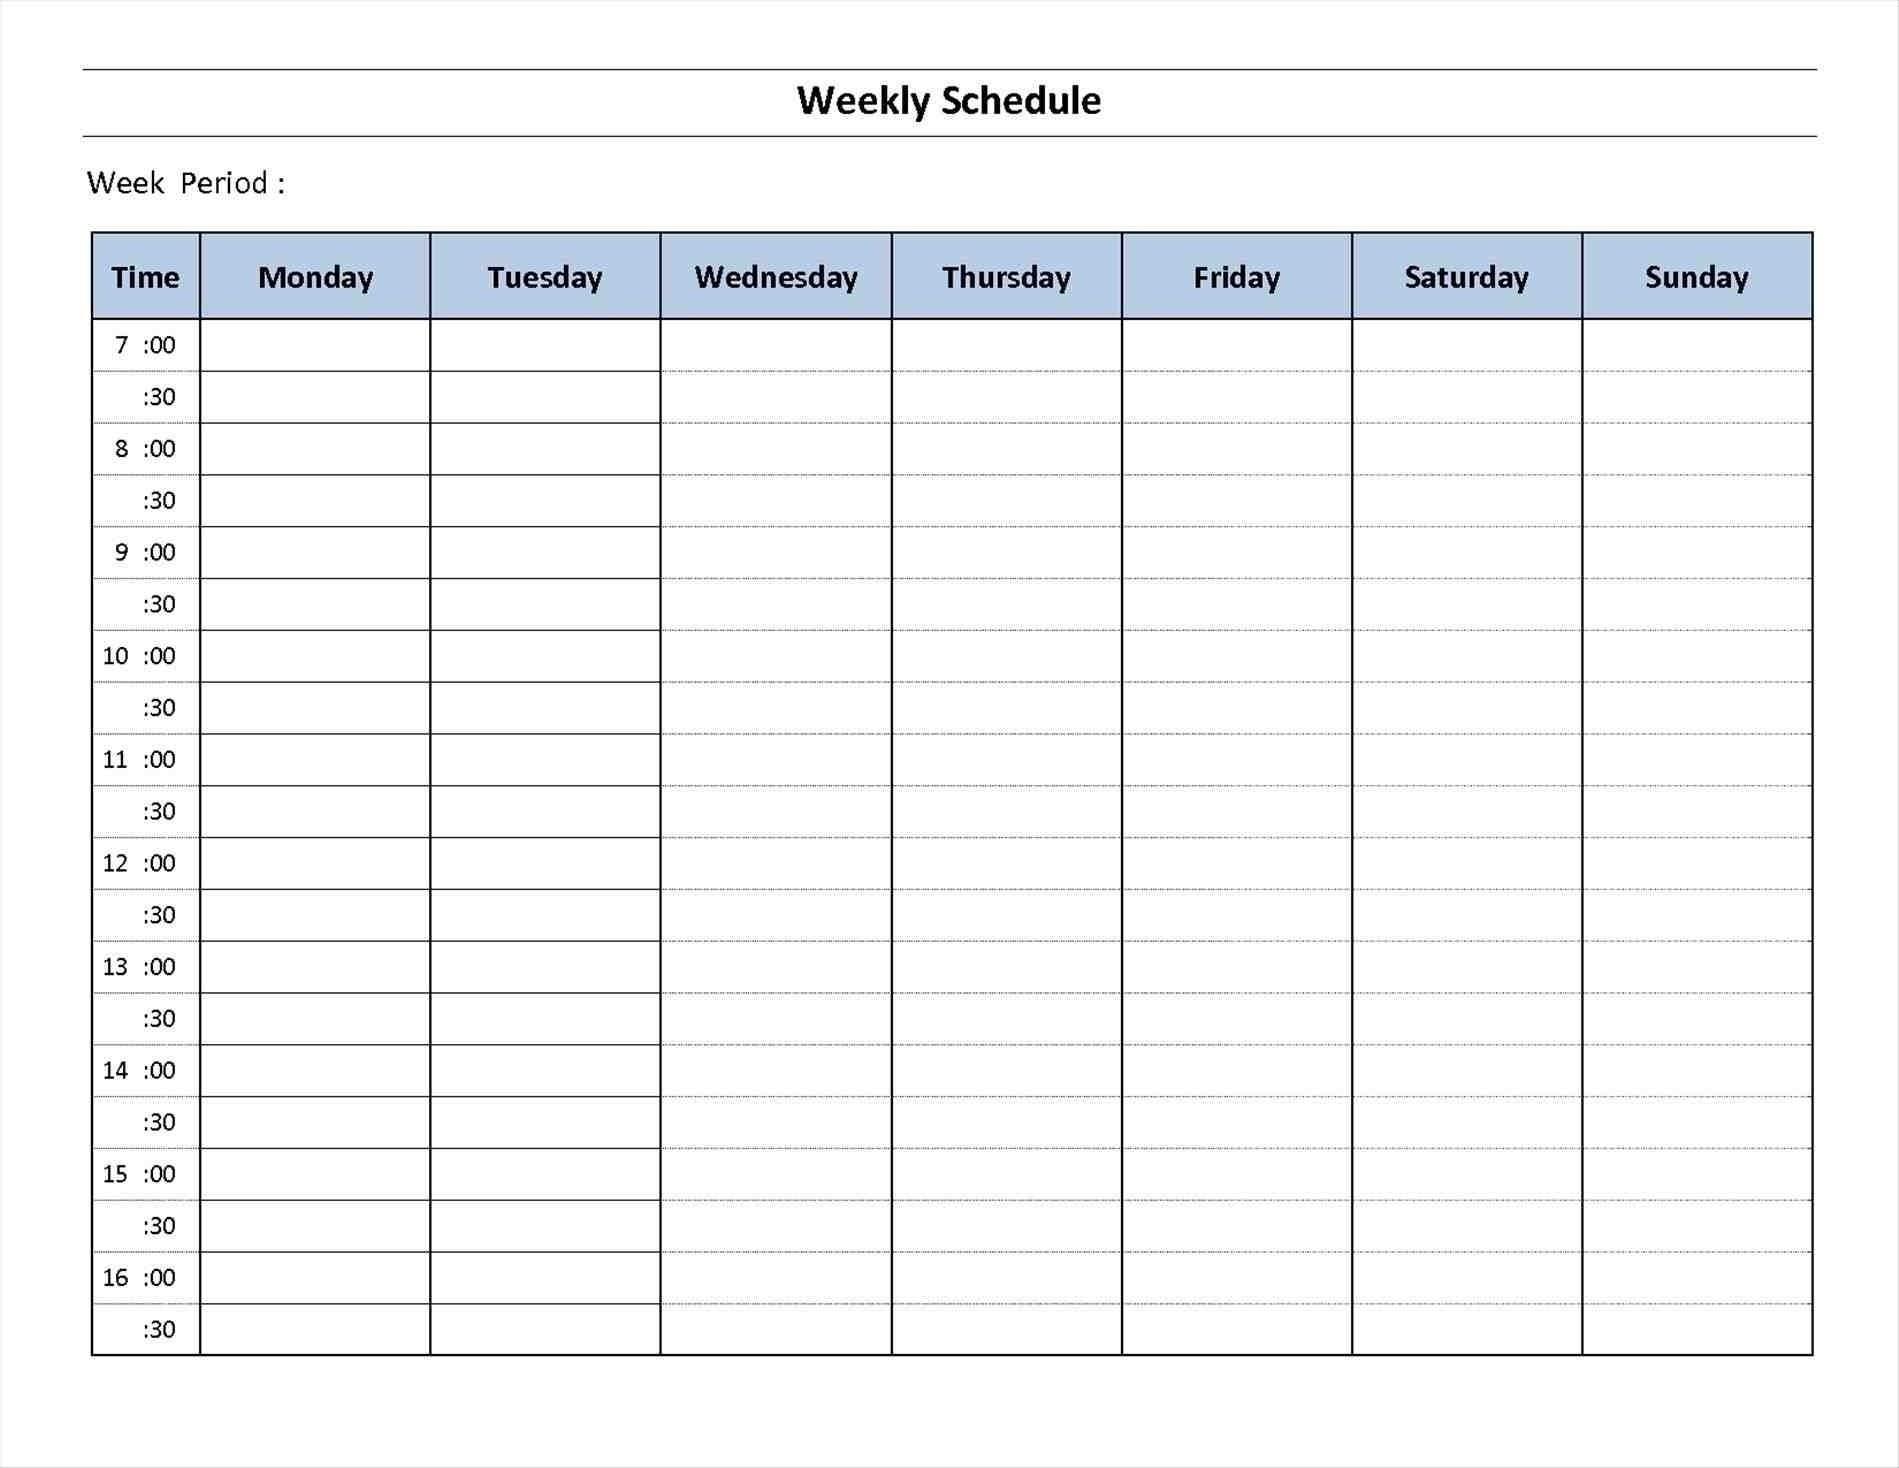 Day Weekly Planner Template Schedule Week Calendar Printable | Smorad pertaining to 7 Day Weekly Planner Template